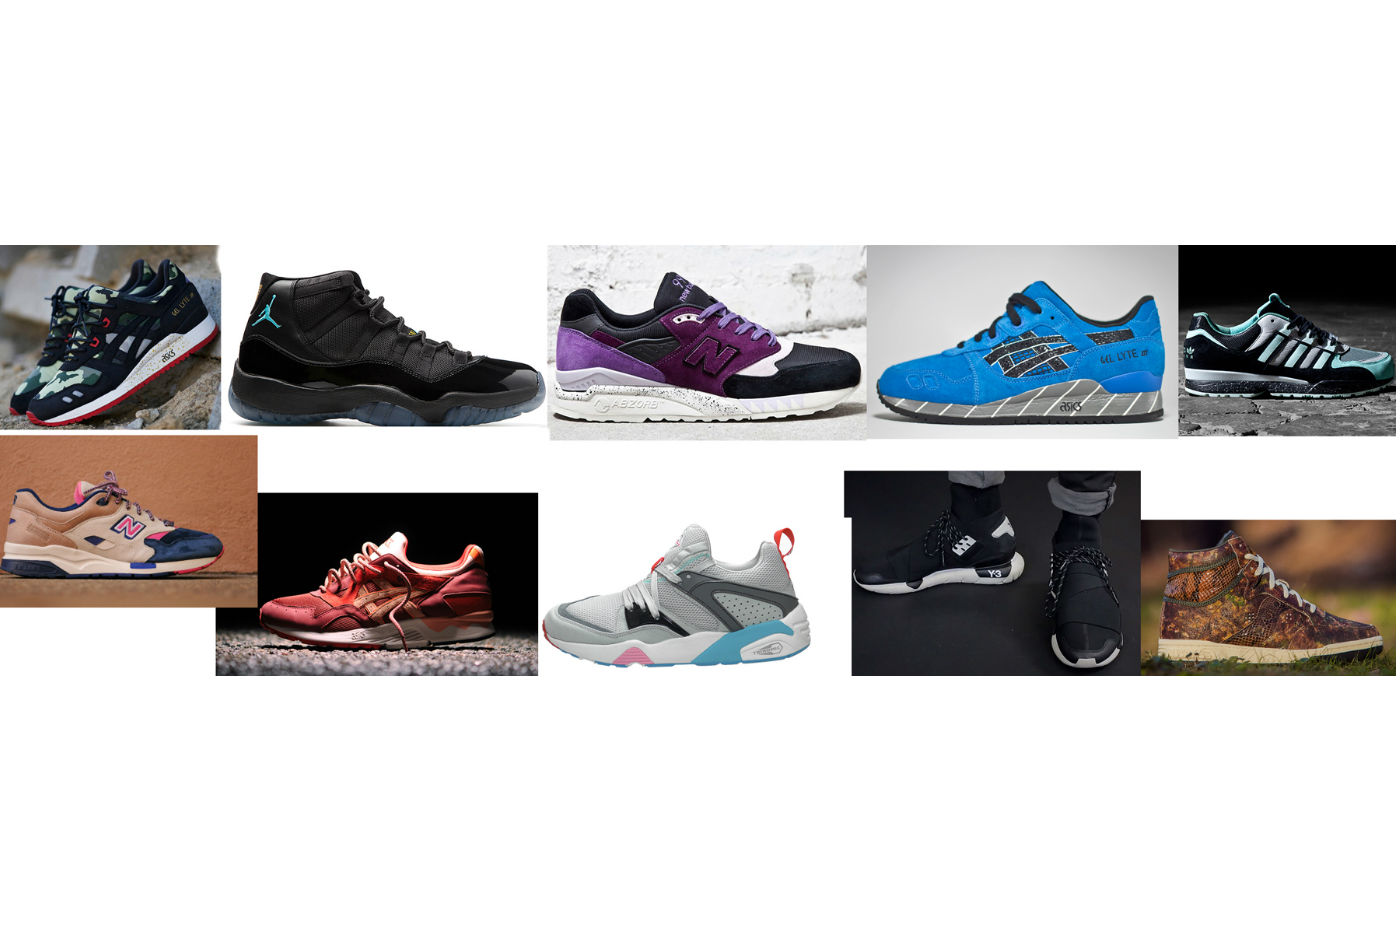 Top 10 Sneakers 2013